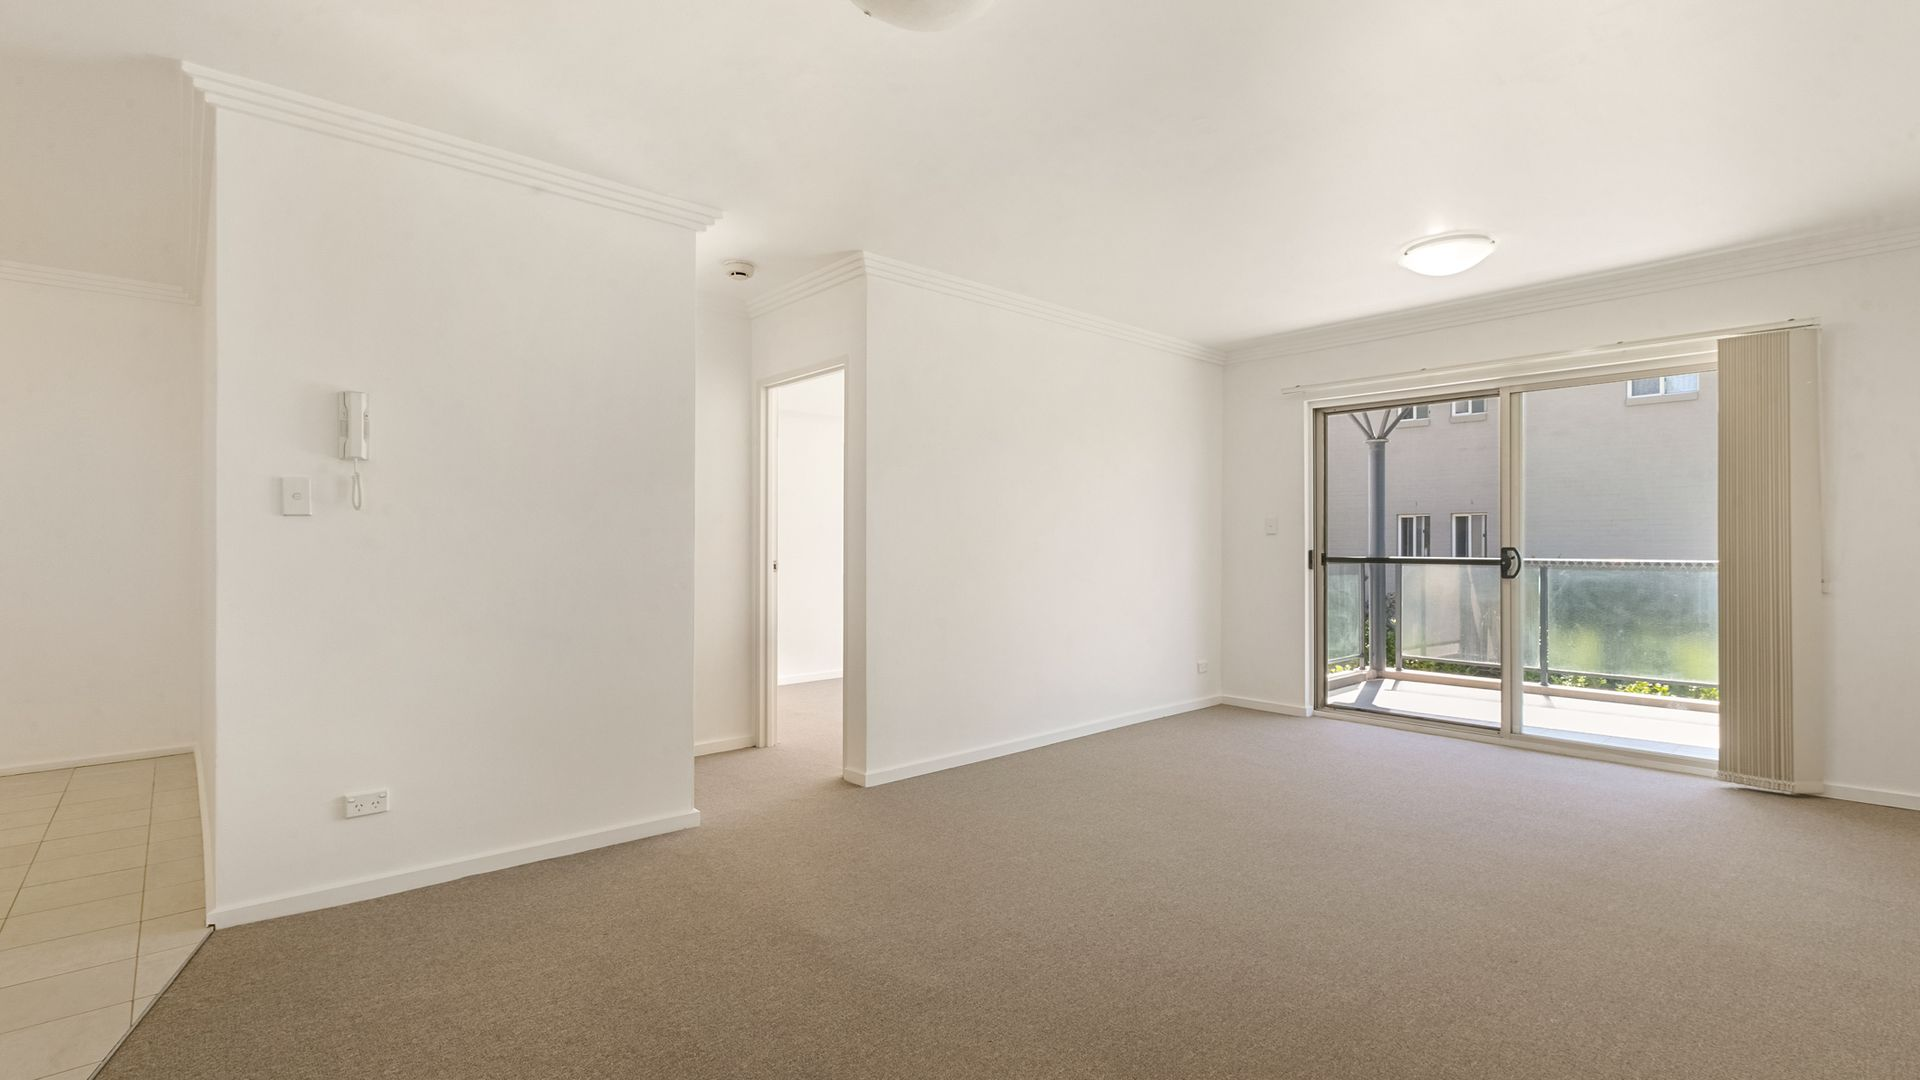 19/34-36 Brookvale Avenue, Brookvale NSW 2100, Image 1